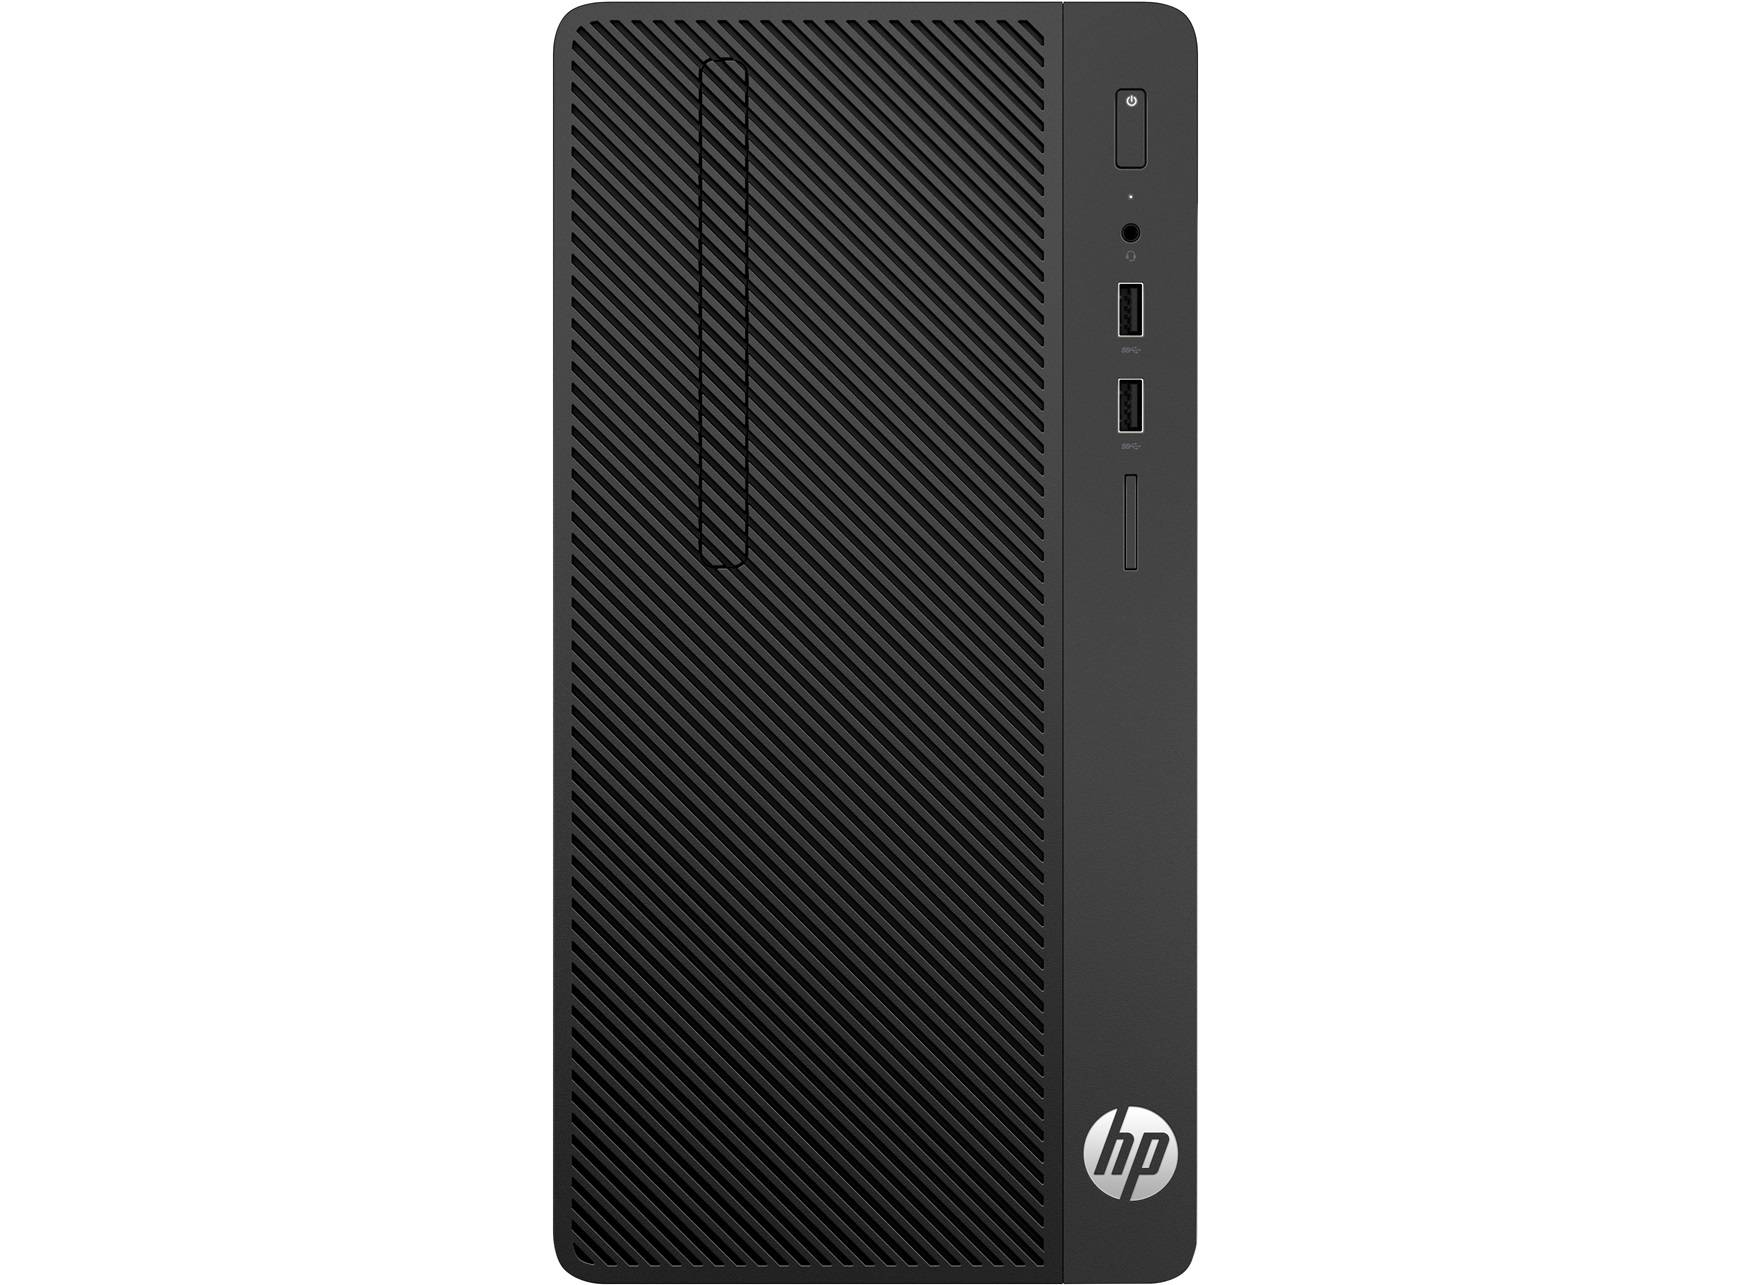 2b99c352e HP 290 G1 Business Desktop Microtower PC Intel Pentium Dual-Core ...